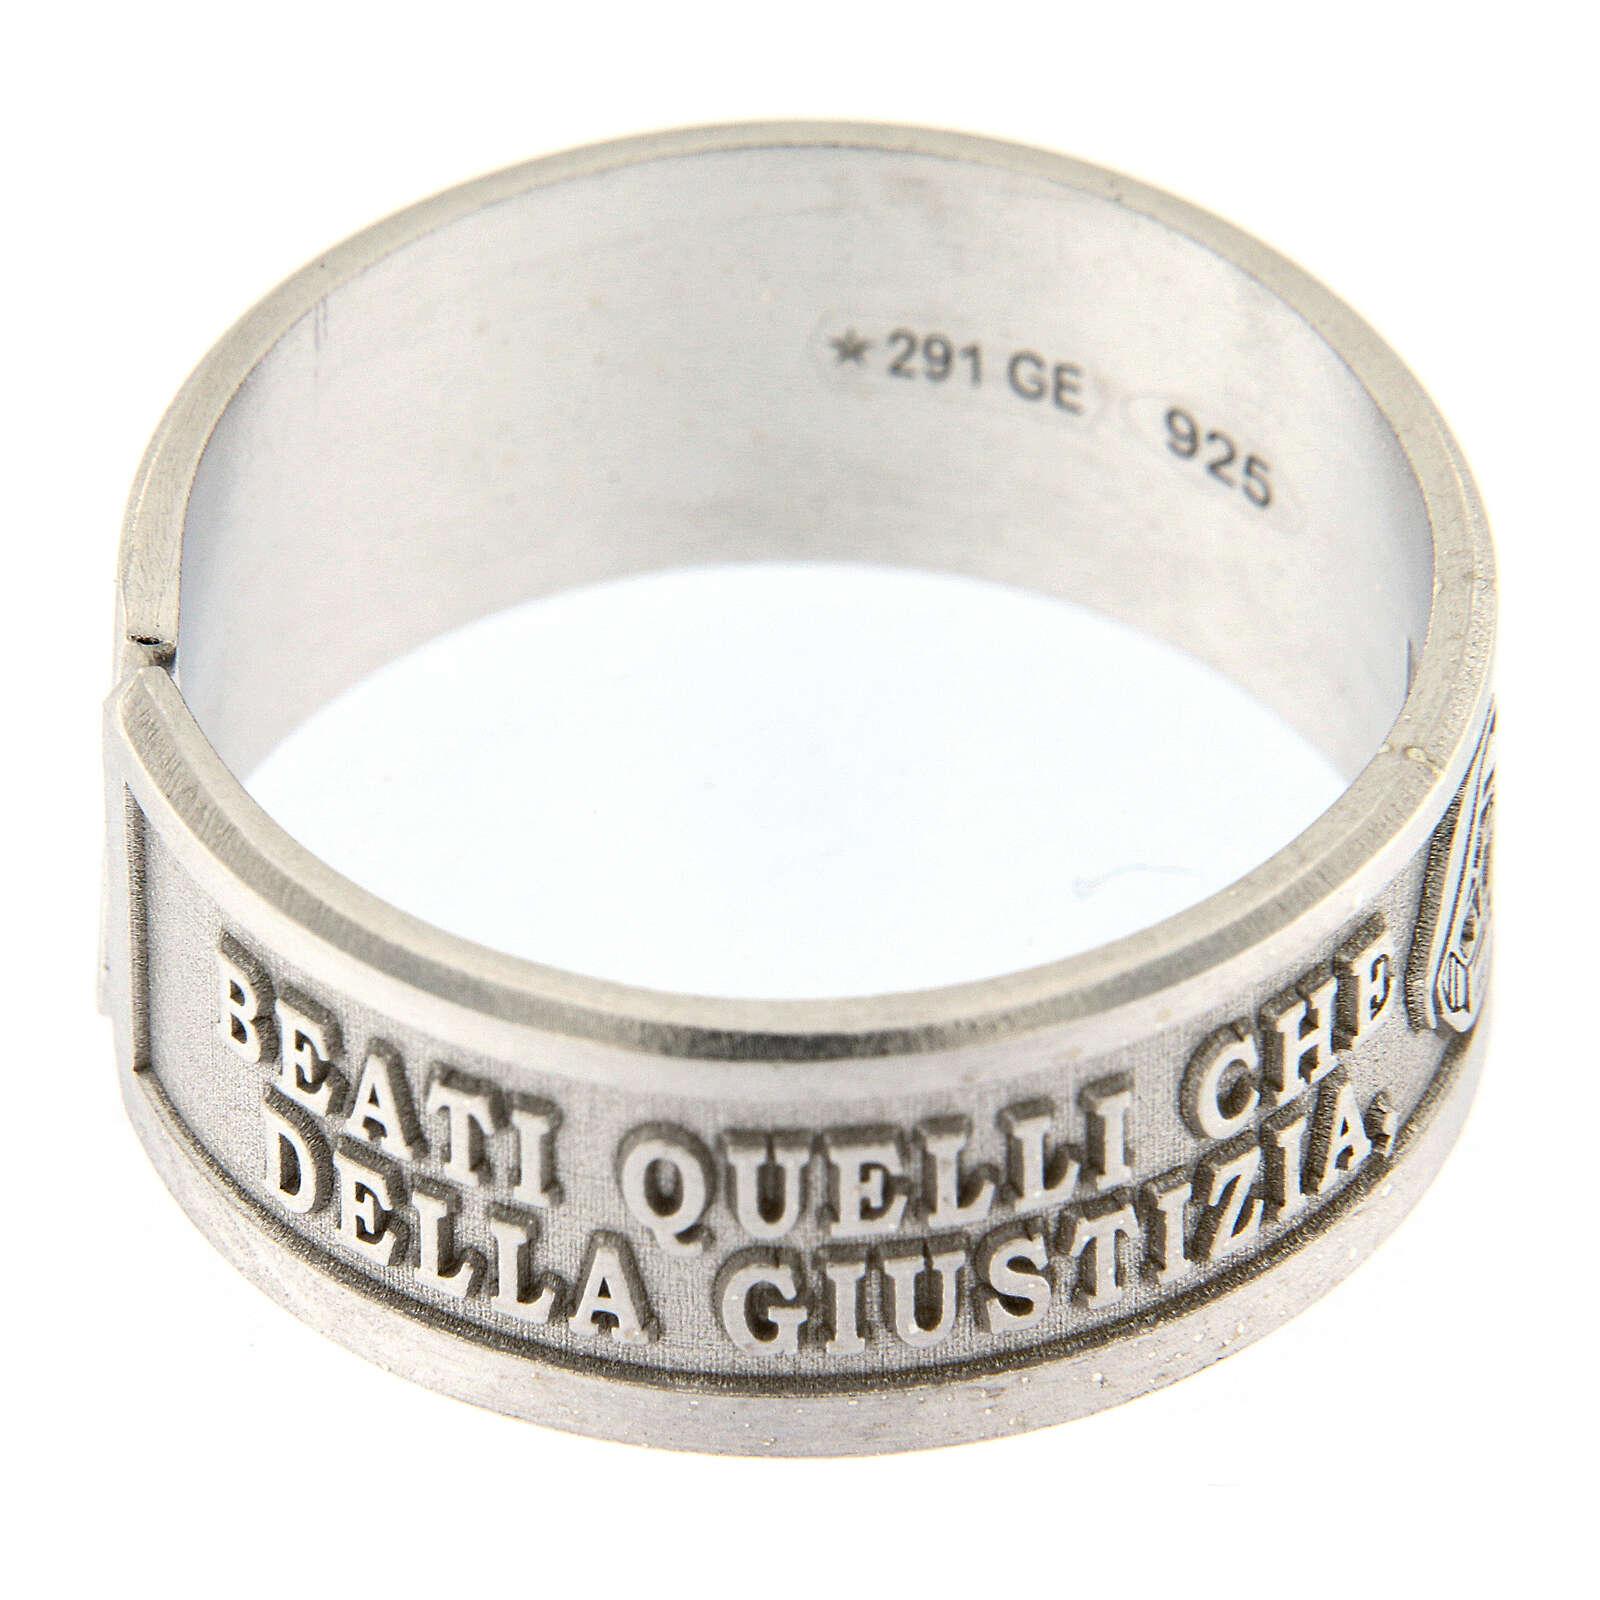 Anillos Beatitudes Fame y Sete di Giustizia plata 925 3